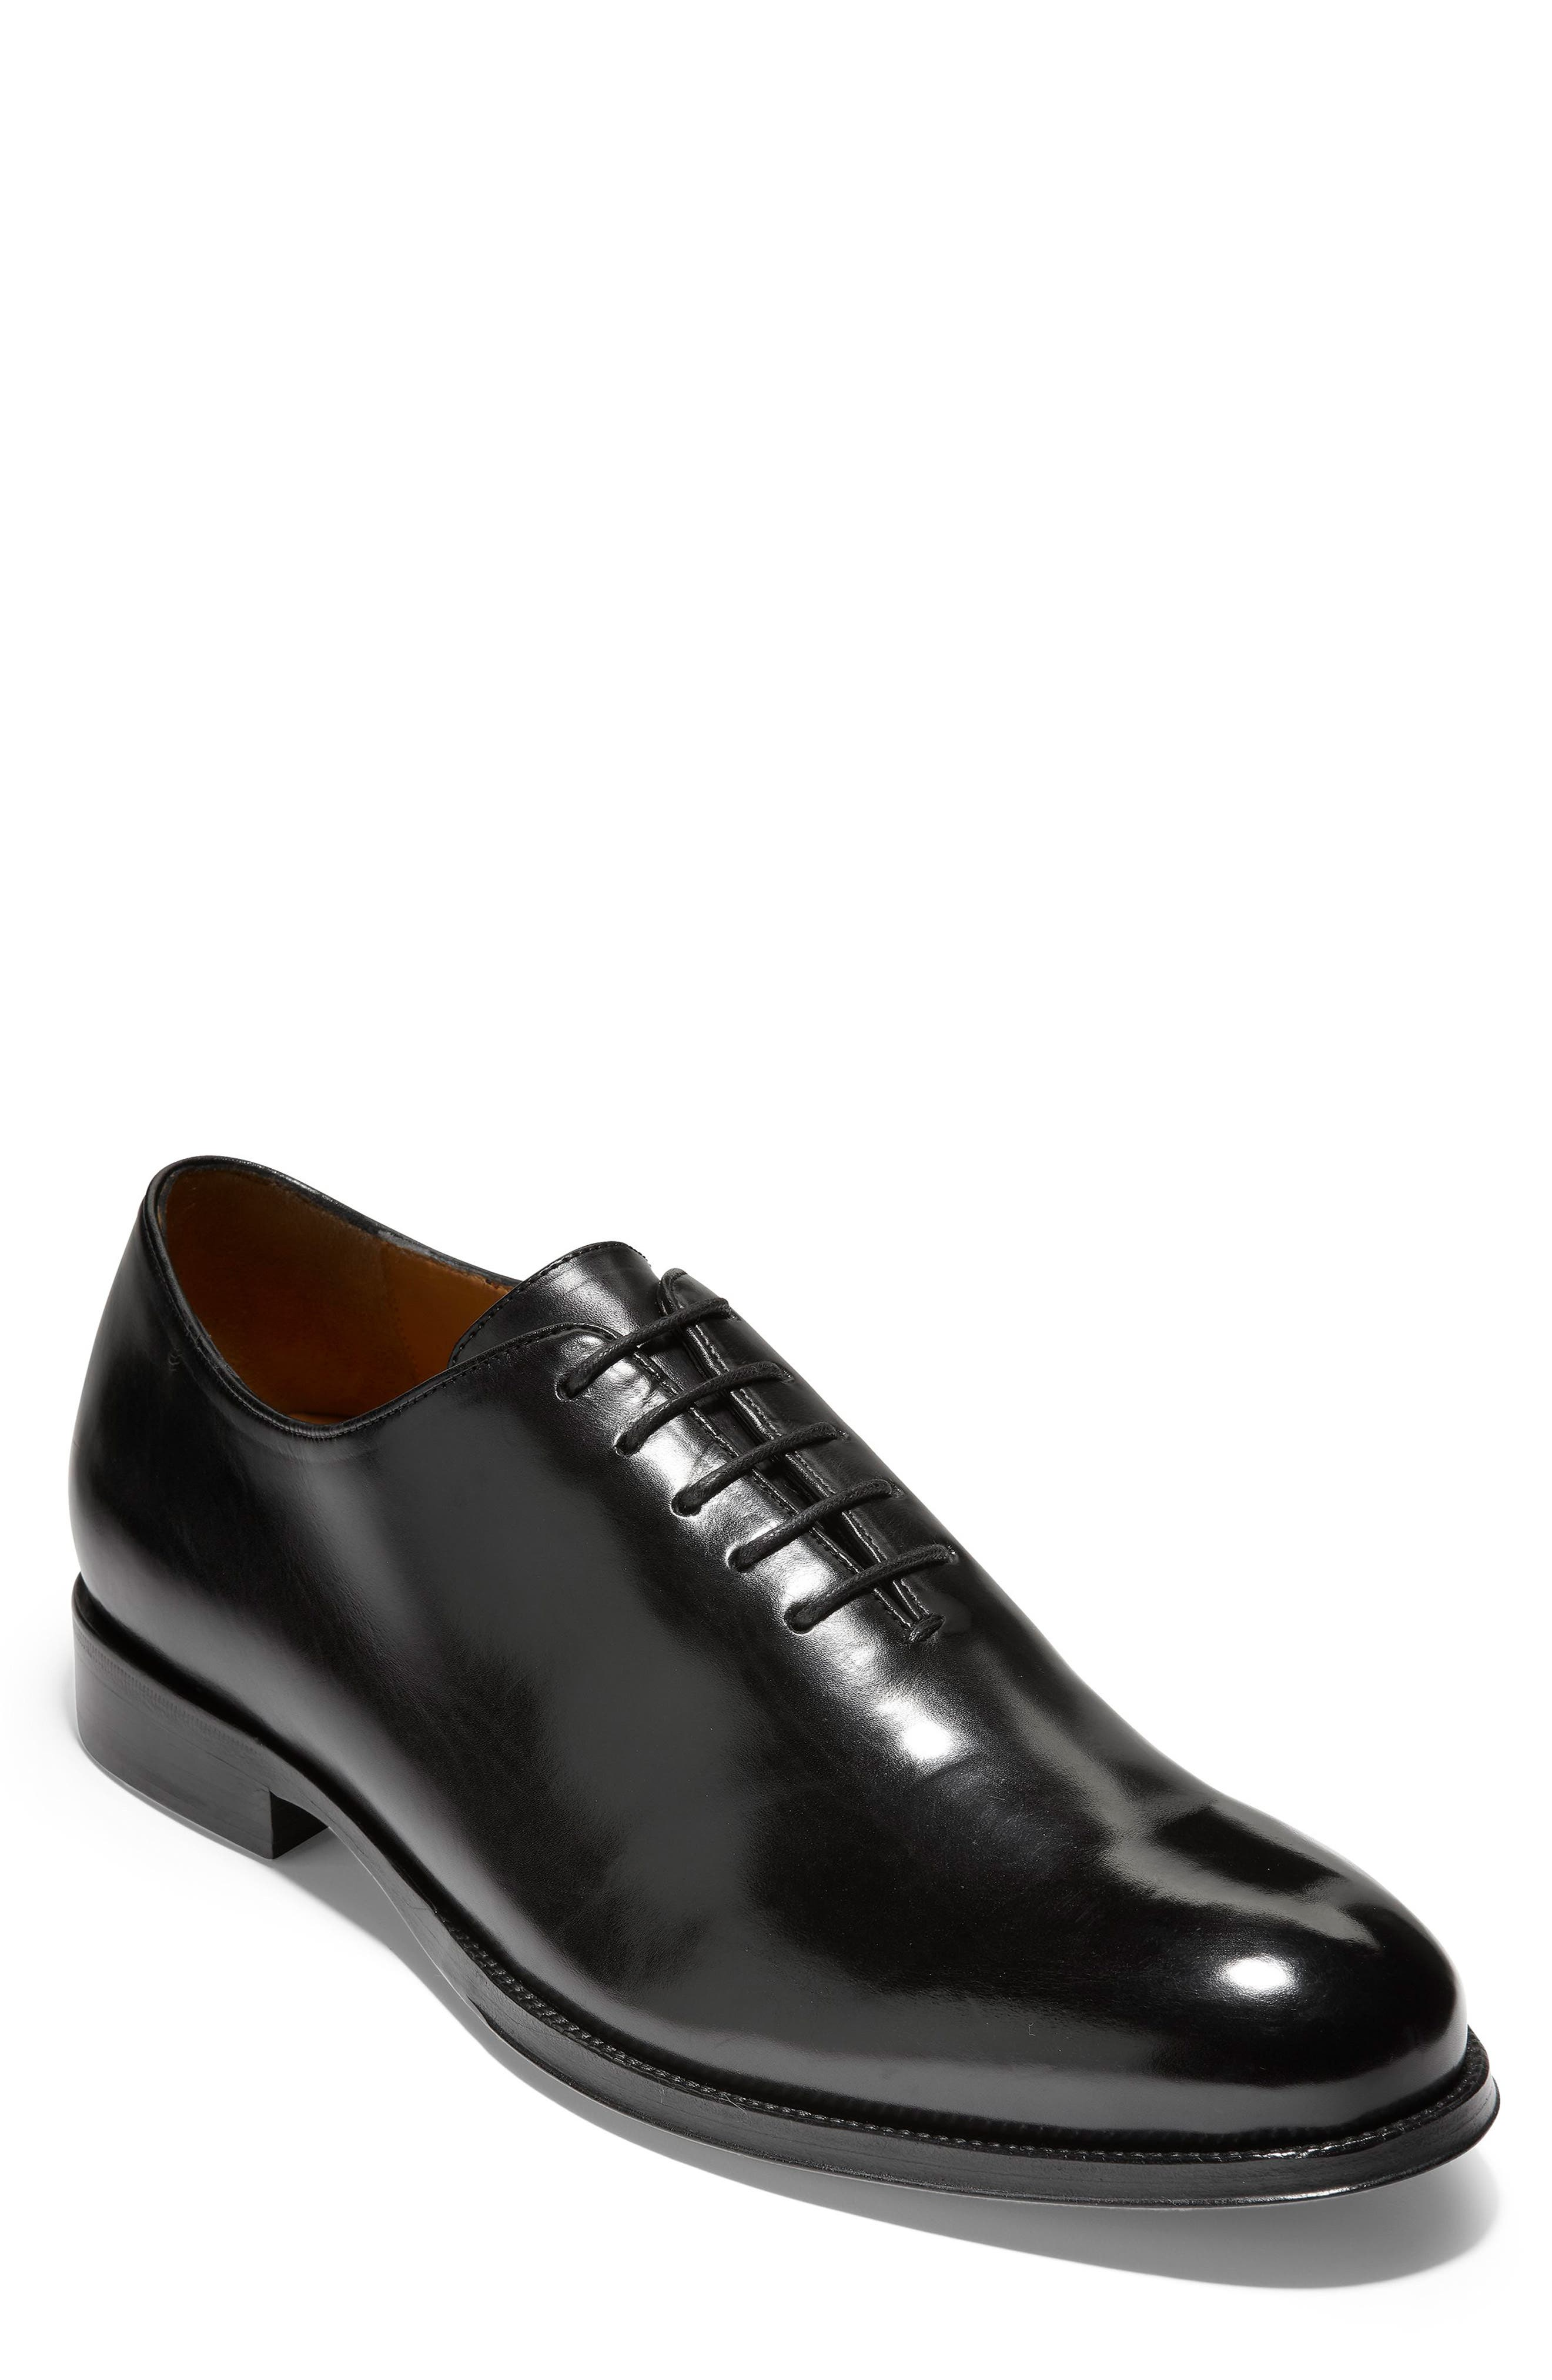 American Classics Gramercy Whole Cut Shoe, Main, color, BLACK LEATHER